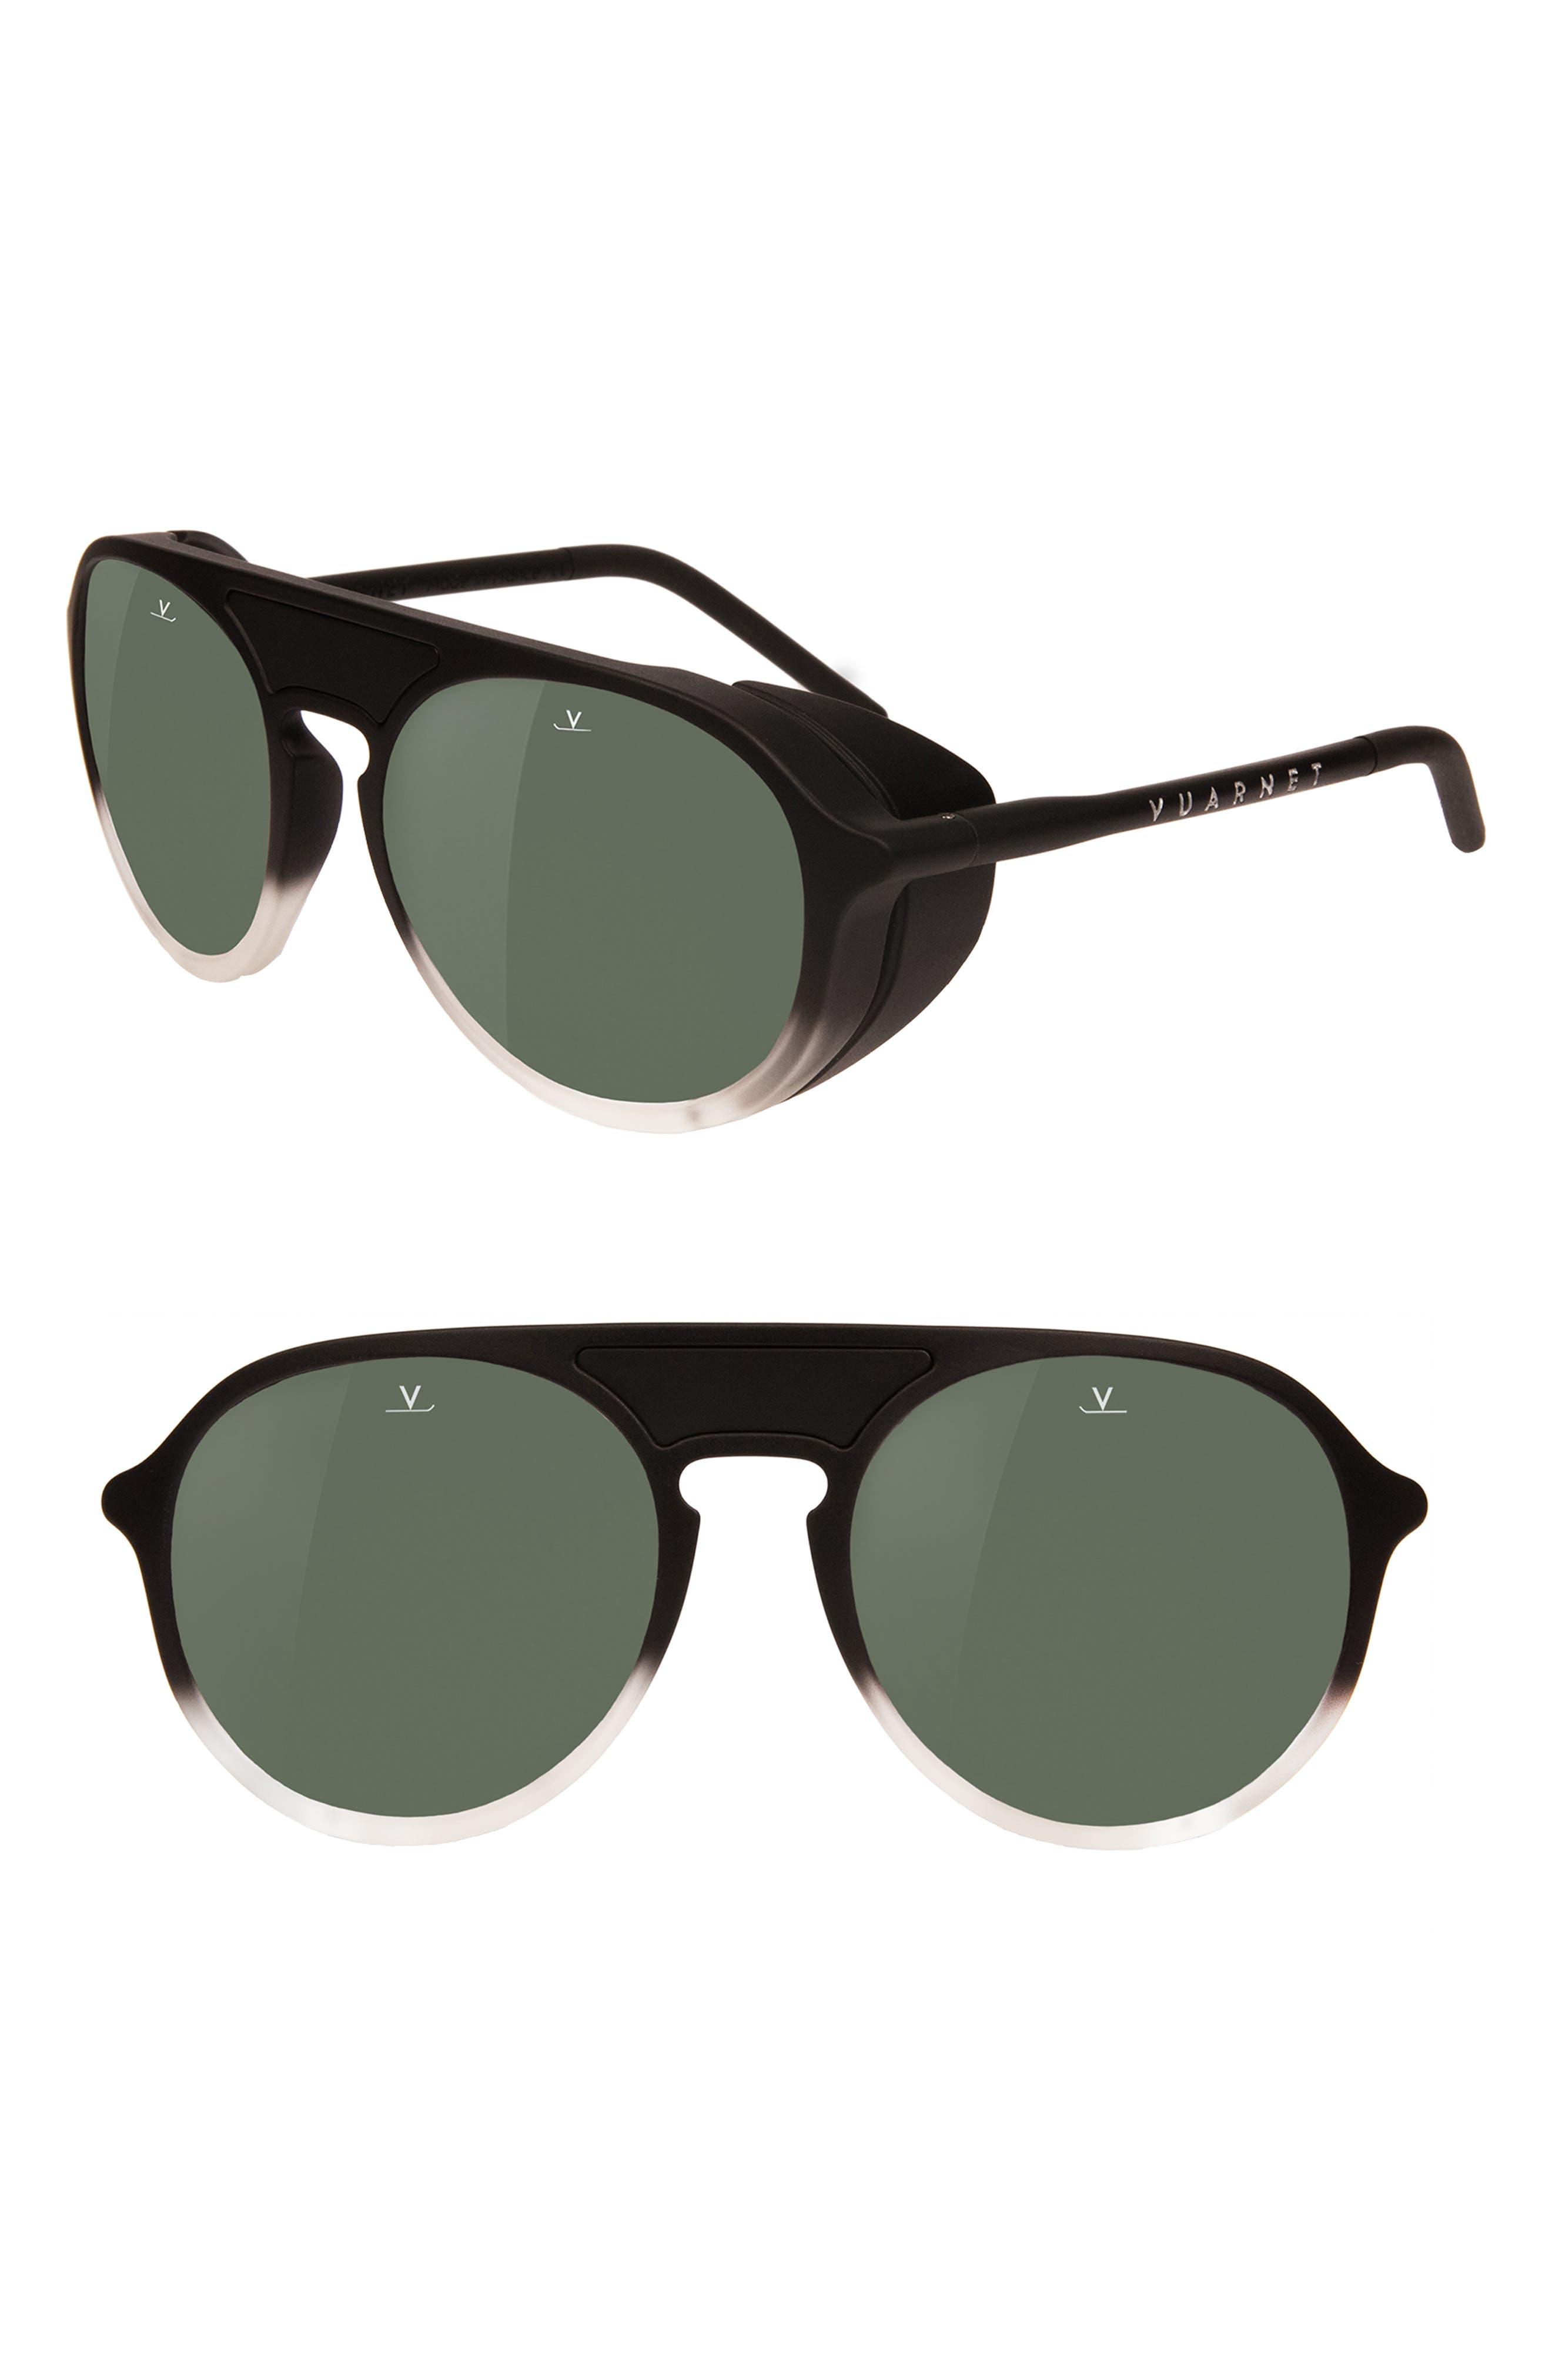 Ice 51mm Polarized Sunglasses,                         Main,                         color, Gradient Black / Grey Polar